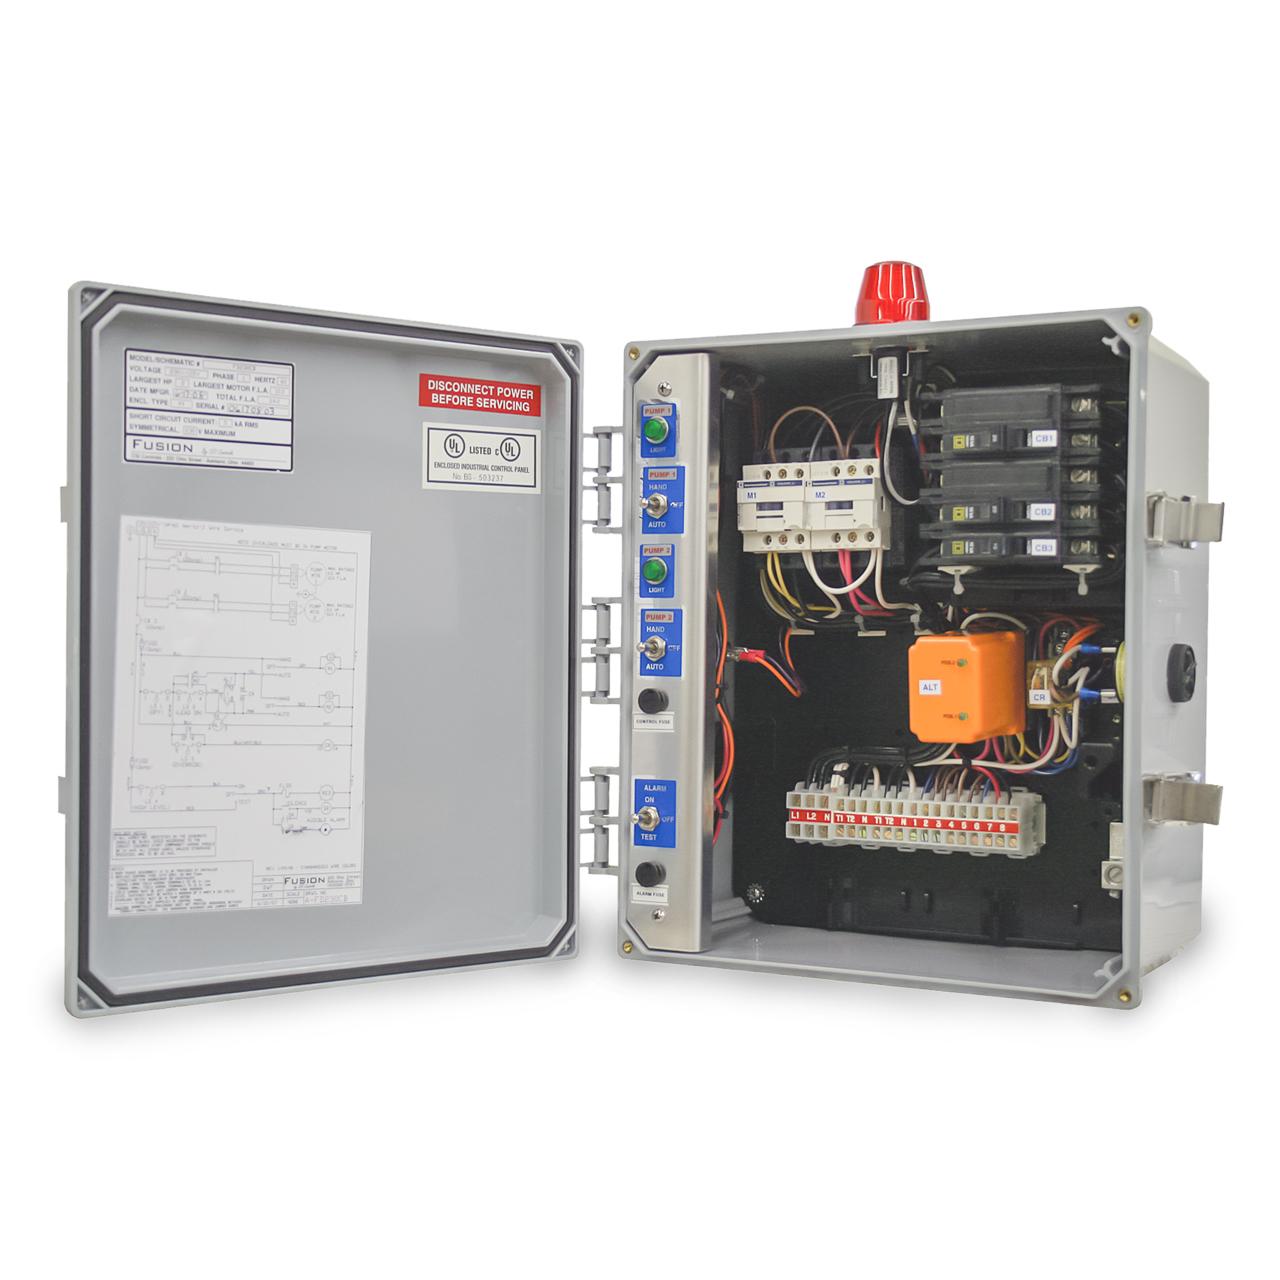 ?resize=665%2C665 magnificent duplex controller wiring diagram pictures inspiration duplex pump control panel wiring diagram at gsmportal.co